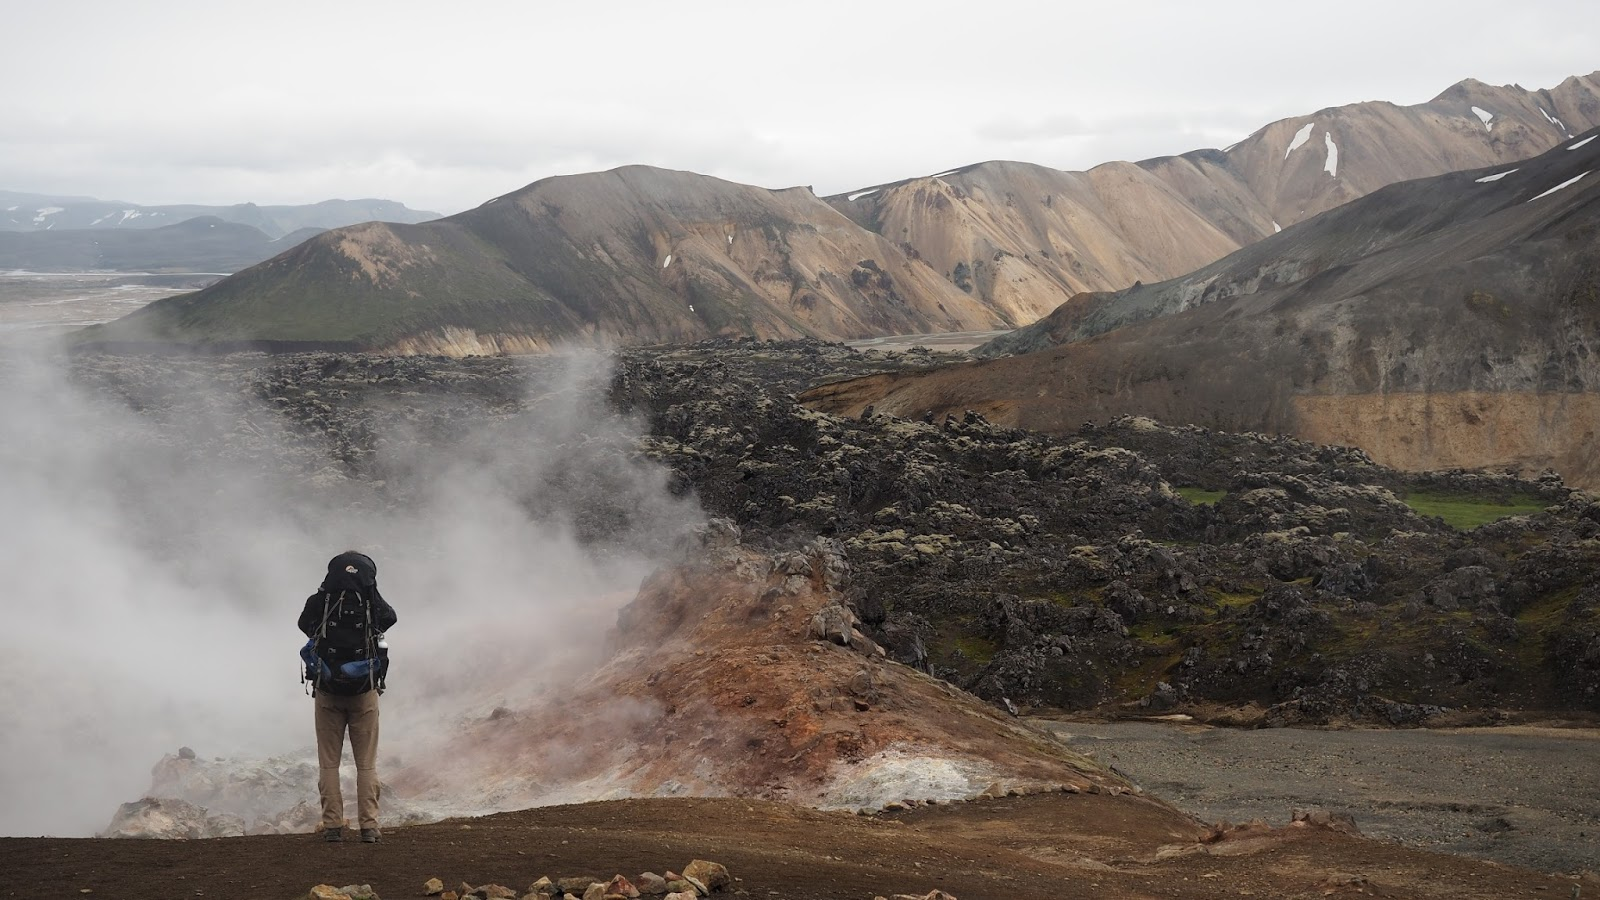 gorące źródła, Islandia hotspring, blog o Islandii